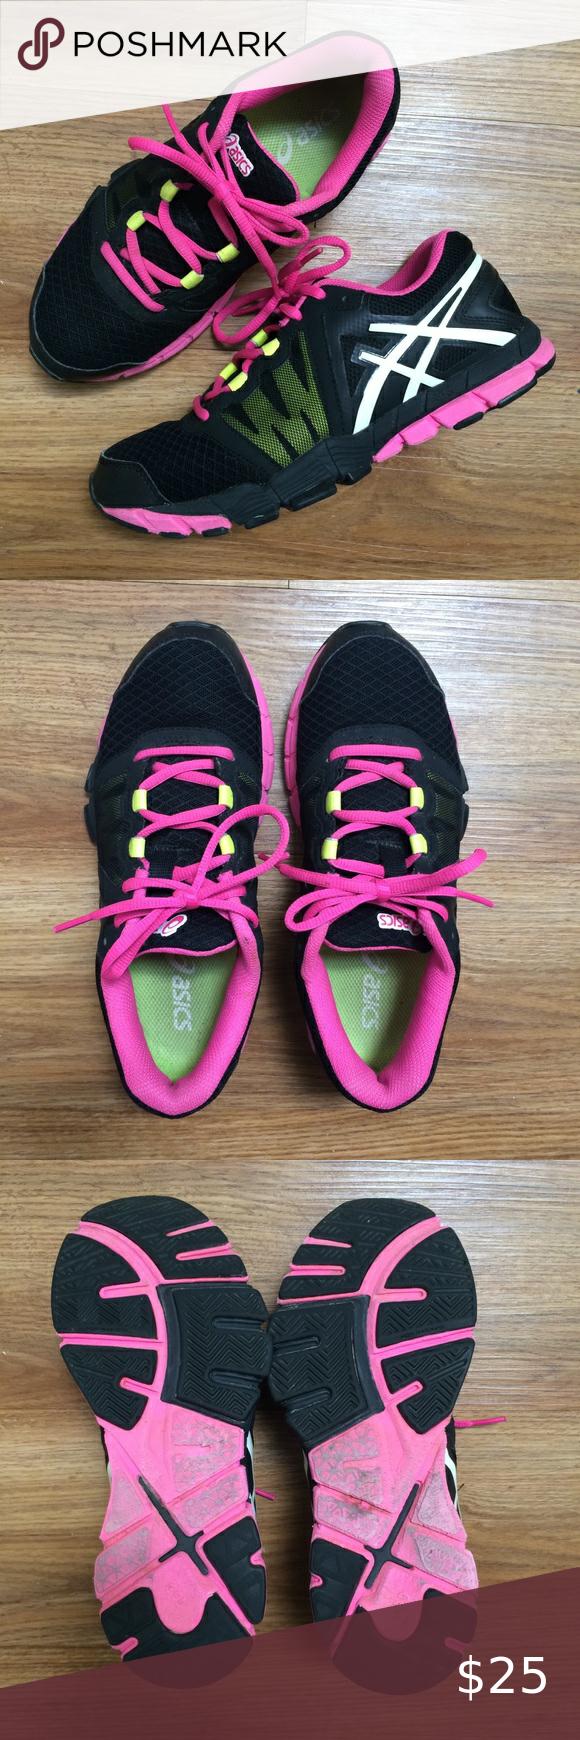 ASICS Gel-Craze TR Cross-Training Shoes